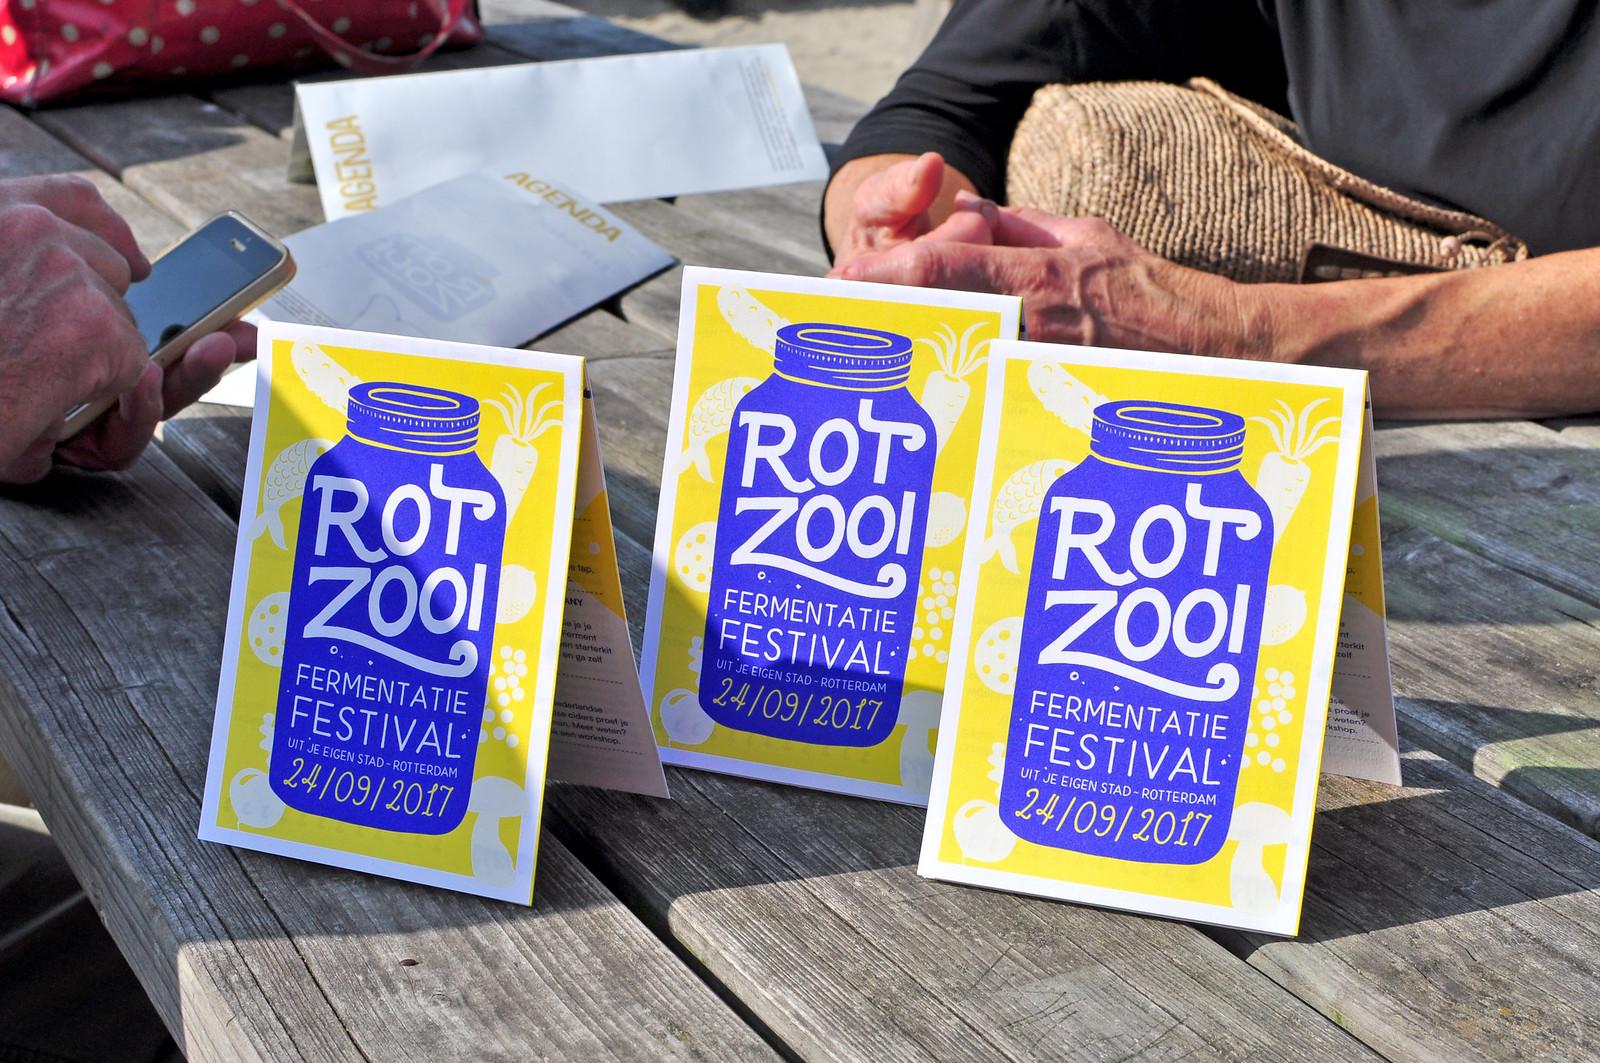 ROTZOOI fermentatiefestival 2017